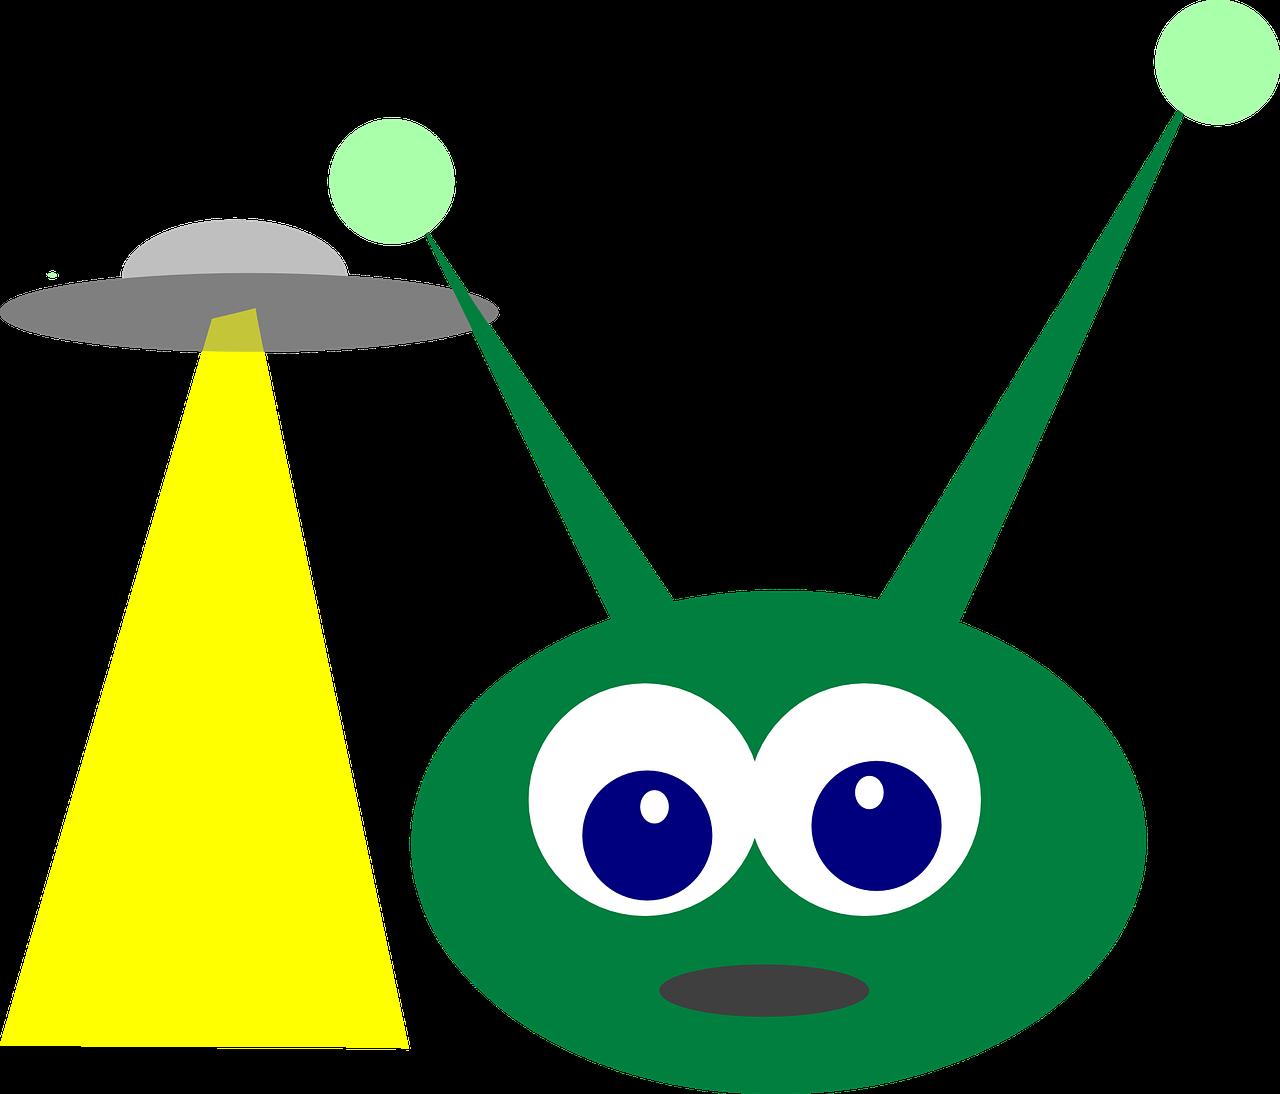 Ship png perfect witnessu. Ufo clipart alien spacecraft